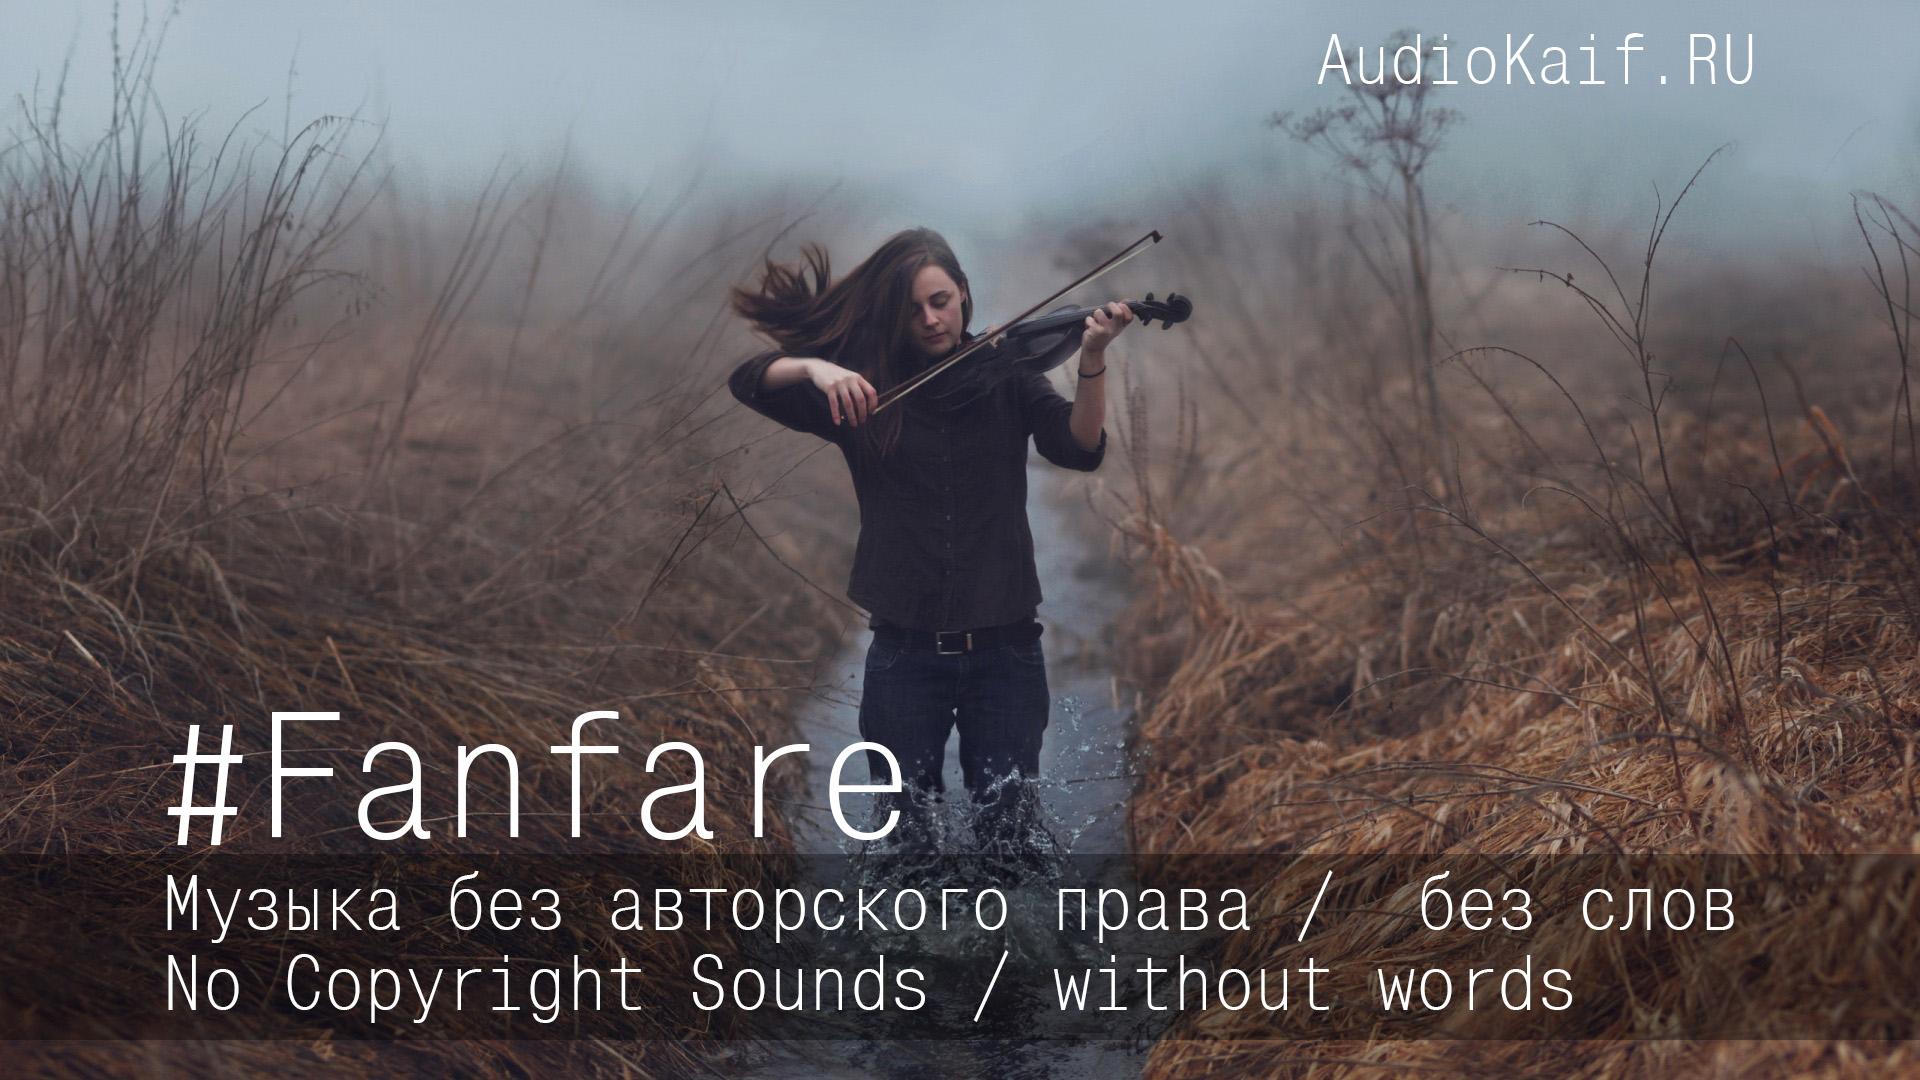 Музыка без авторского права / Perfect Moment 1 - Josef Falkenskold / Fanfare / AudioKaif